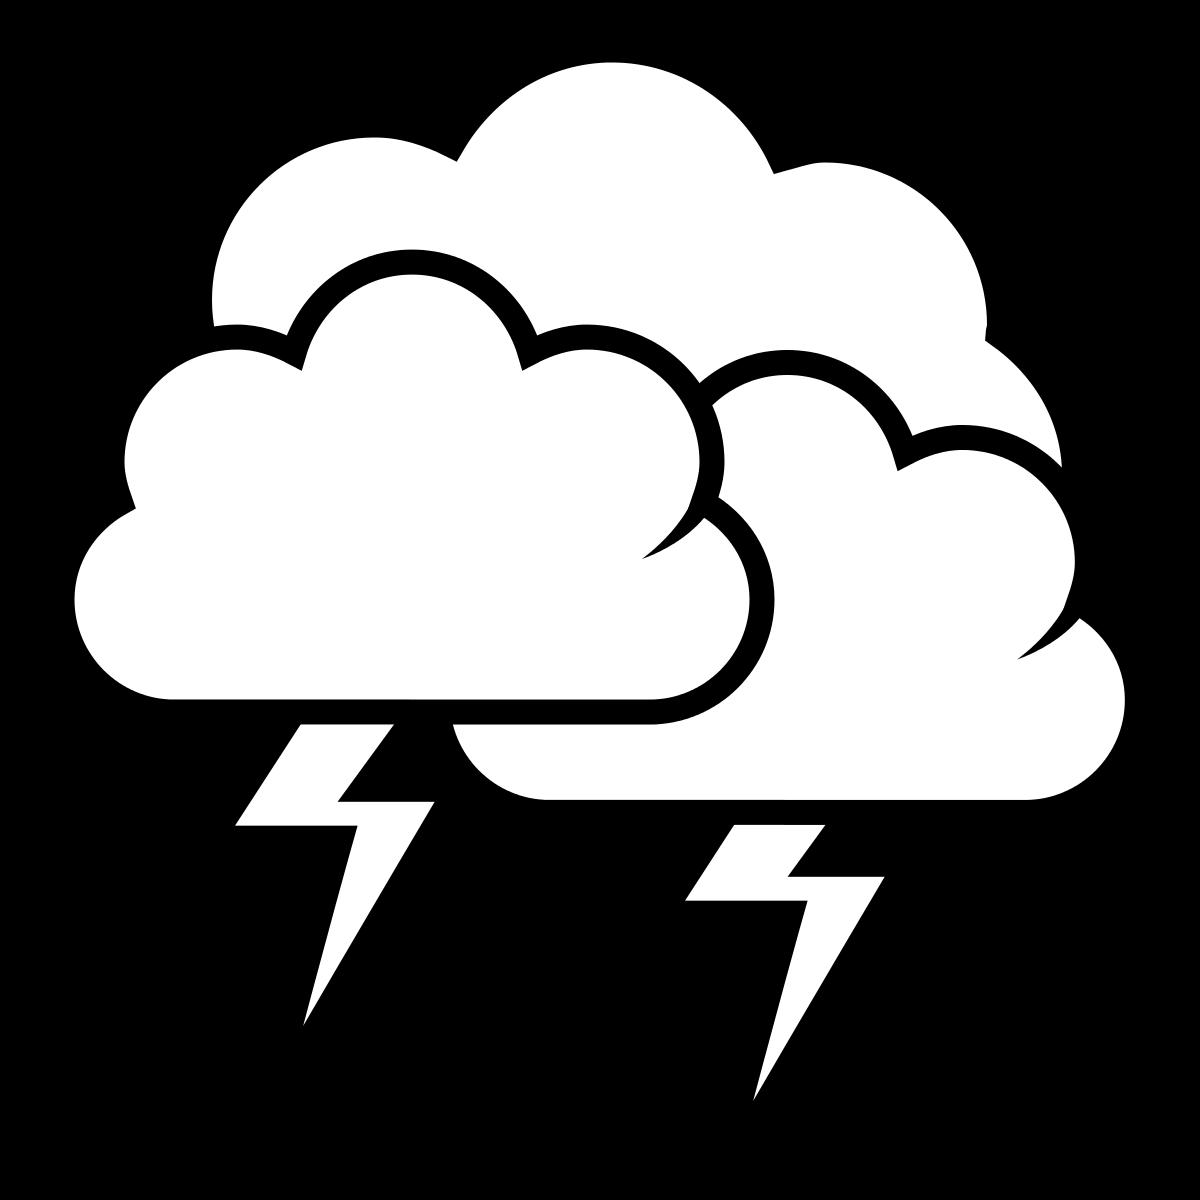 Lightning clipart black and white image Lightning clipart black and white 4 » Clipart Station image